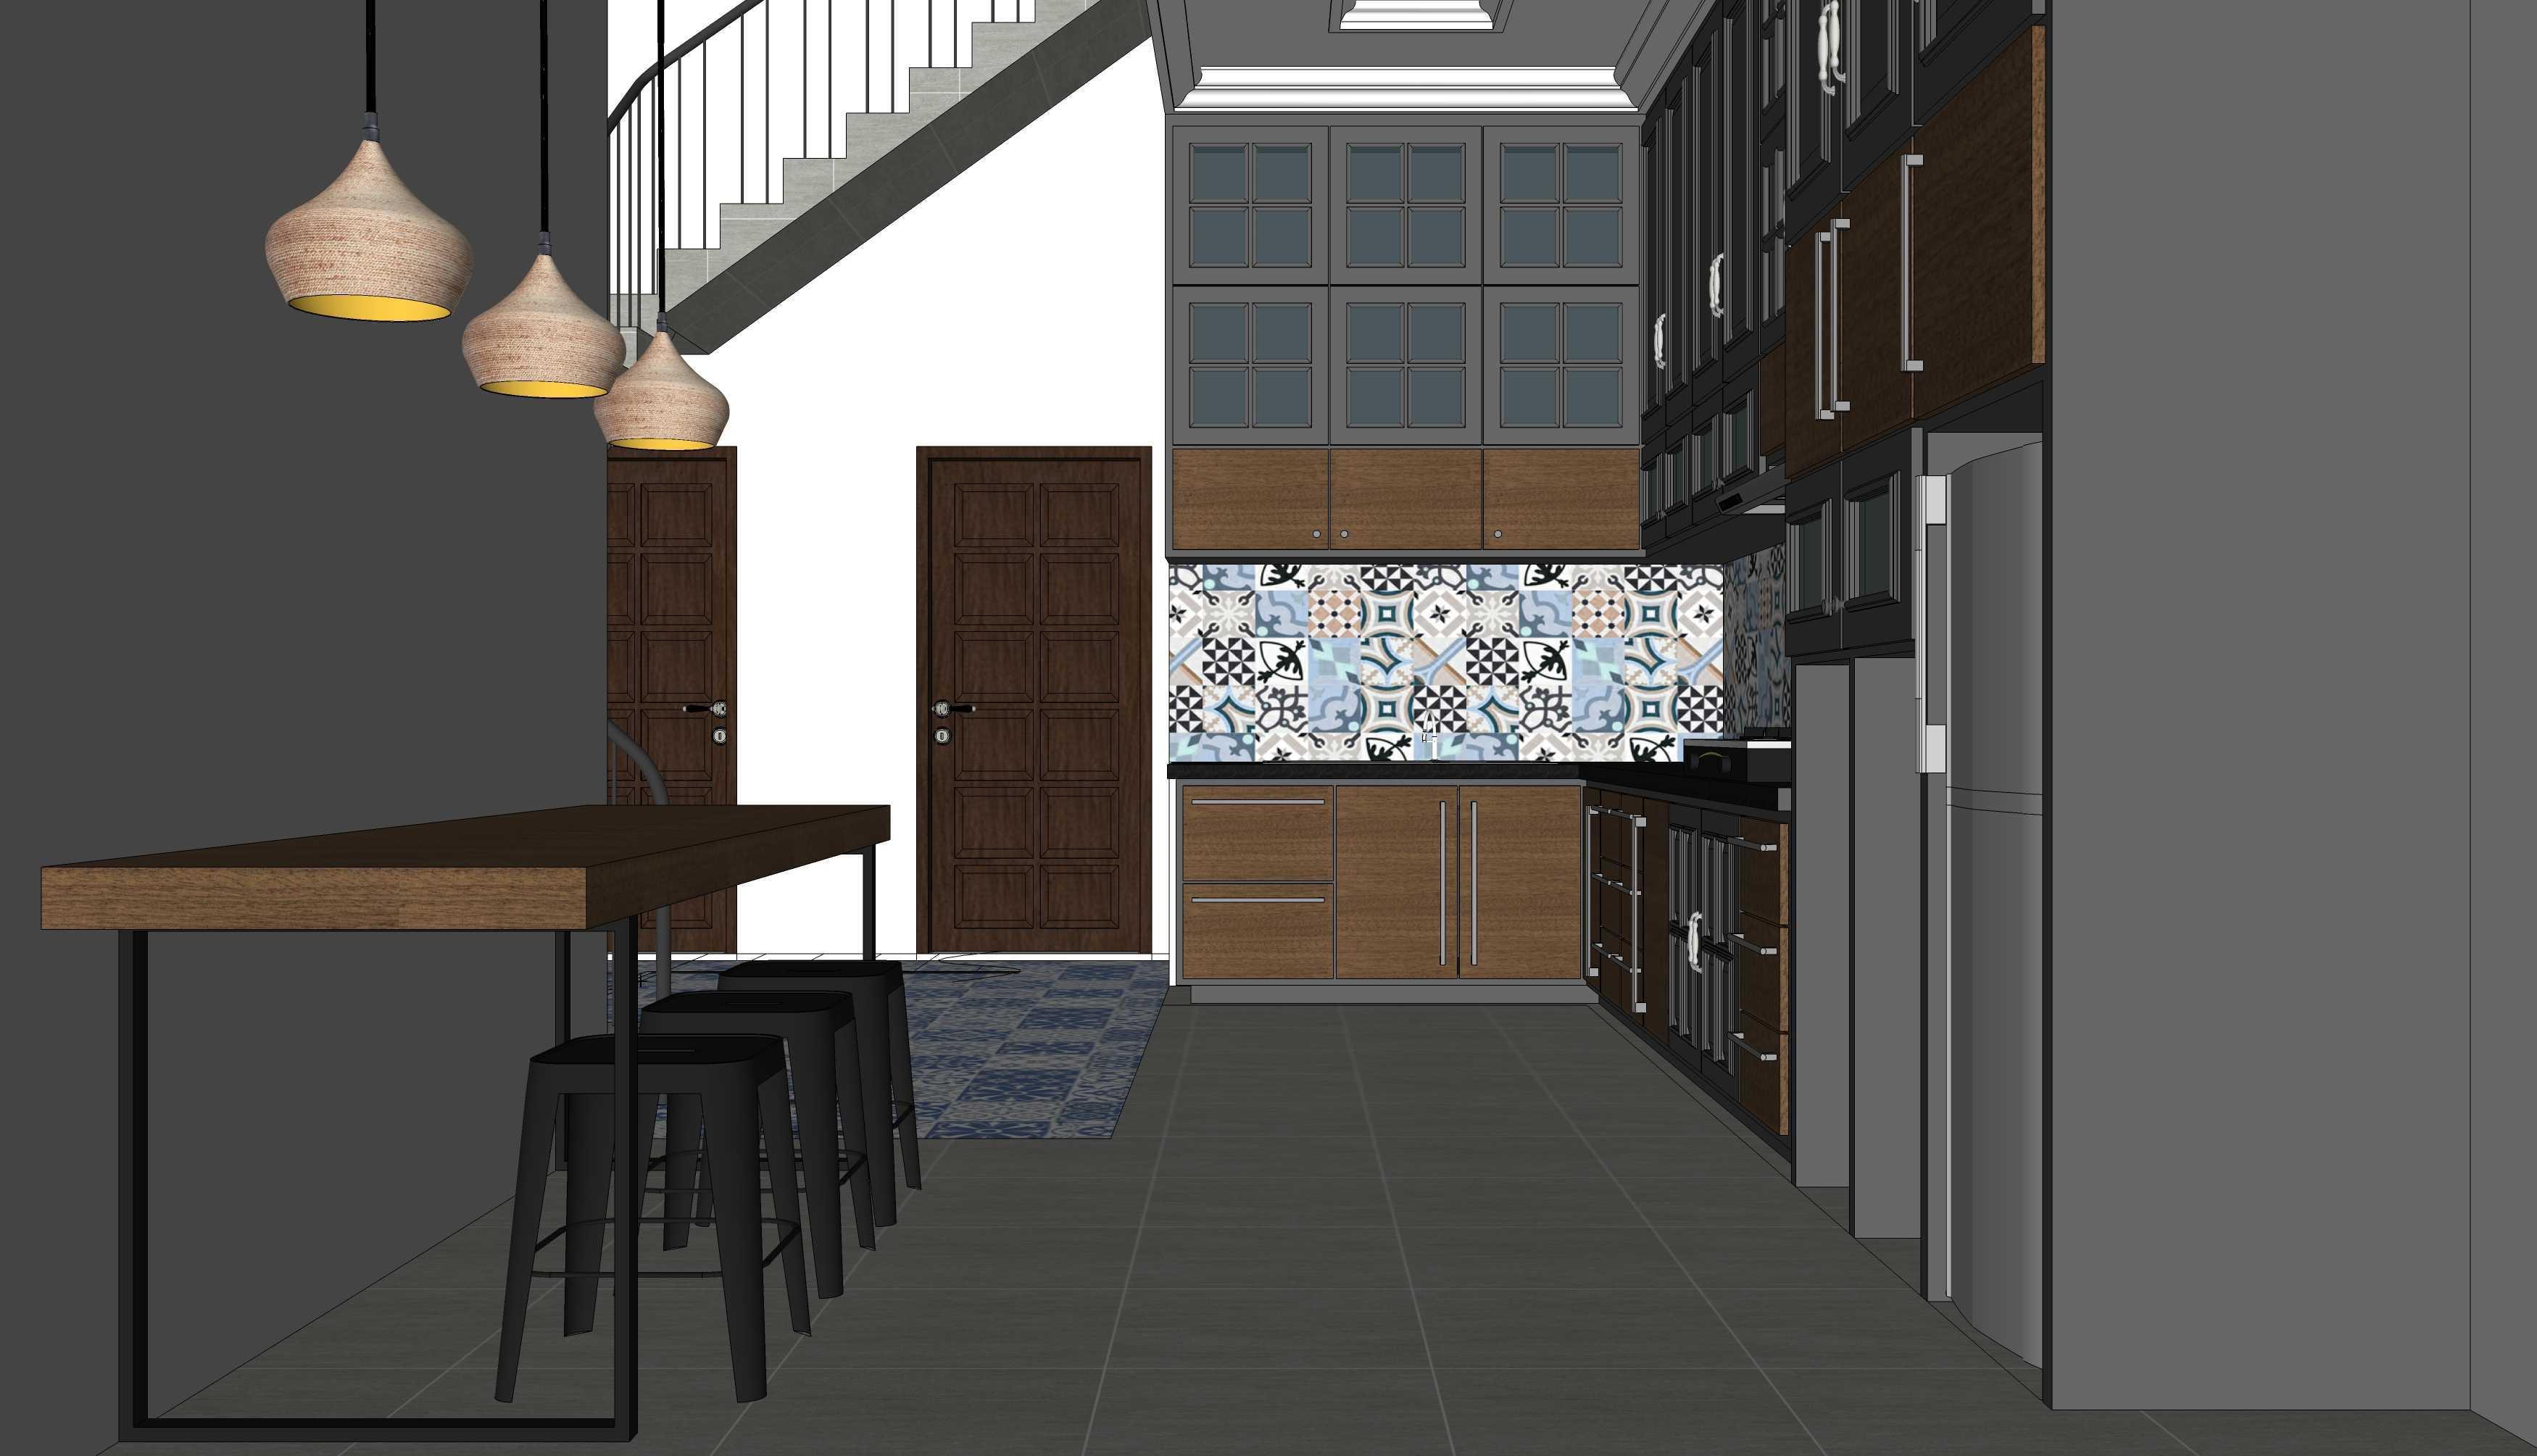 Miv Architects (Ar. Muhammad Ikhsan Hamiru, Iai & Partners) J-House Kota Makassar, Sulawesi Selatan, Indonesia Kota Makassar, Sulawesi Selatan, Indonesia Kitchen & Dining Room Kontemporer  42886